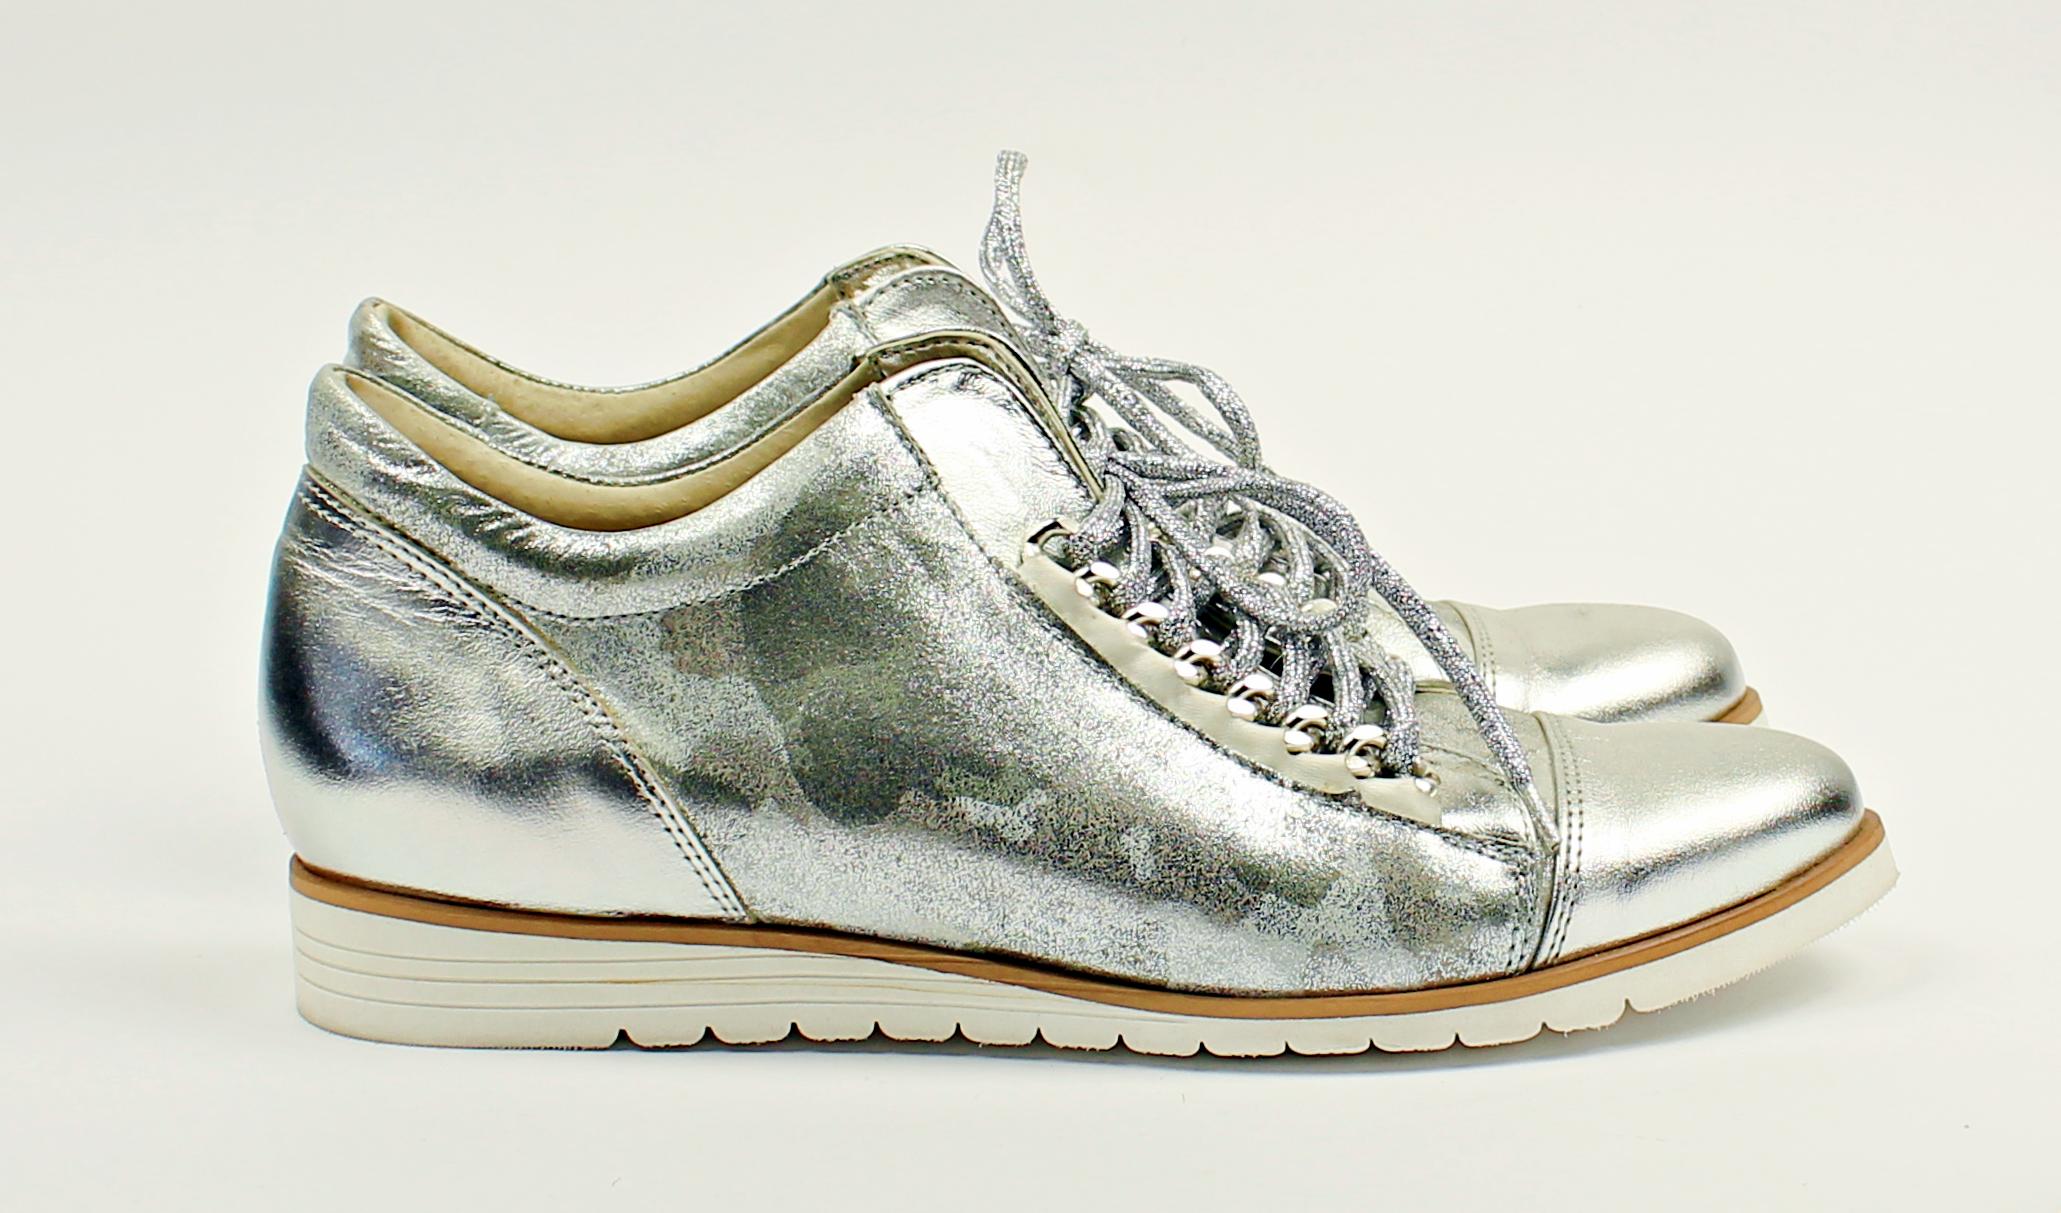 Srebrne Blyszczace Polbuty Na Wiazanie Na Bialej Podeszwie Www Buciarnia Pl Vans Old Skool Sneaker Vans Sneaker Vans